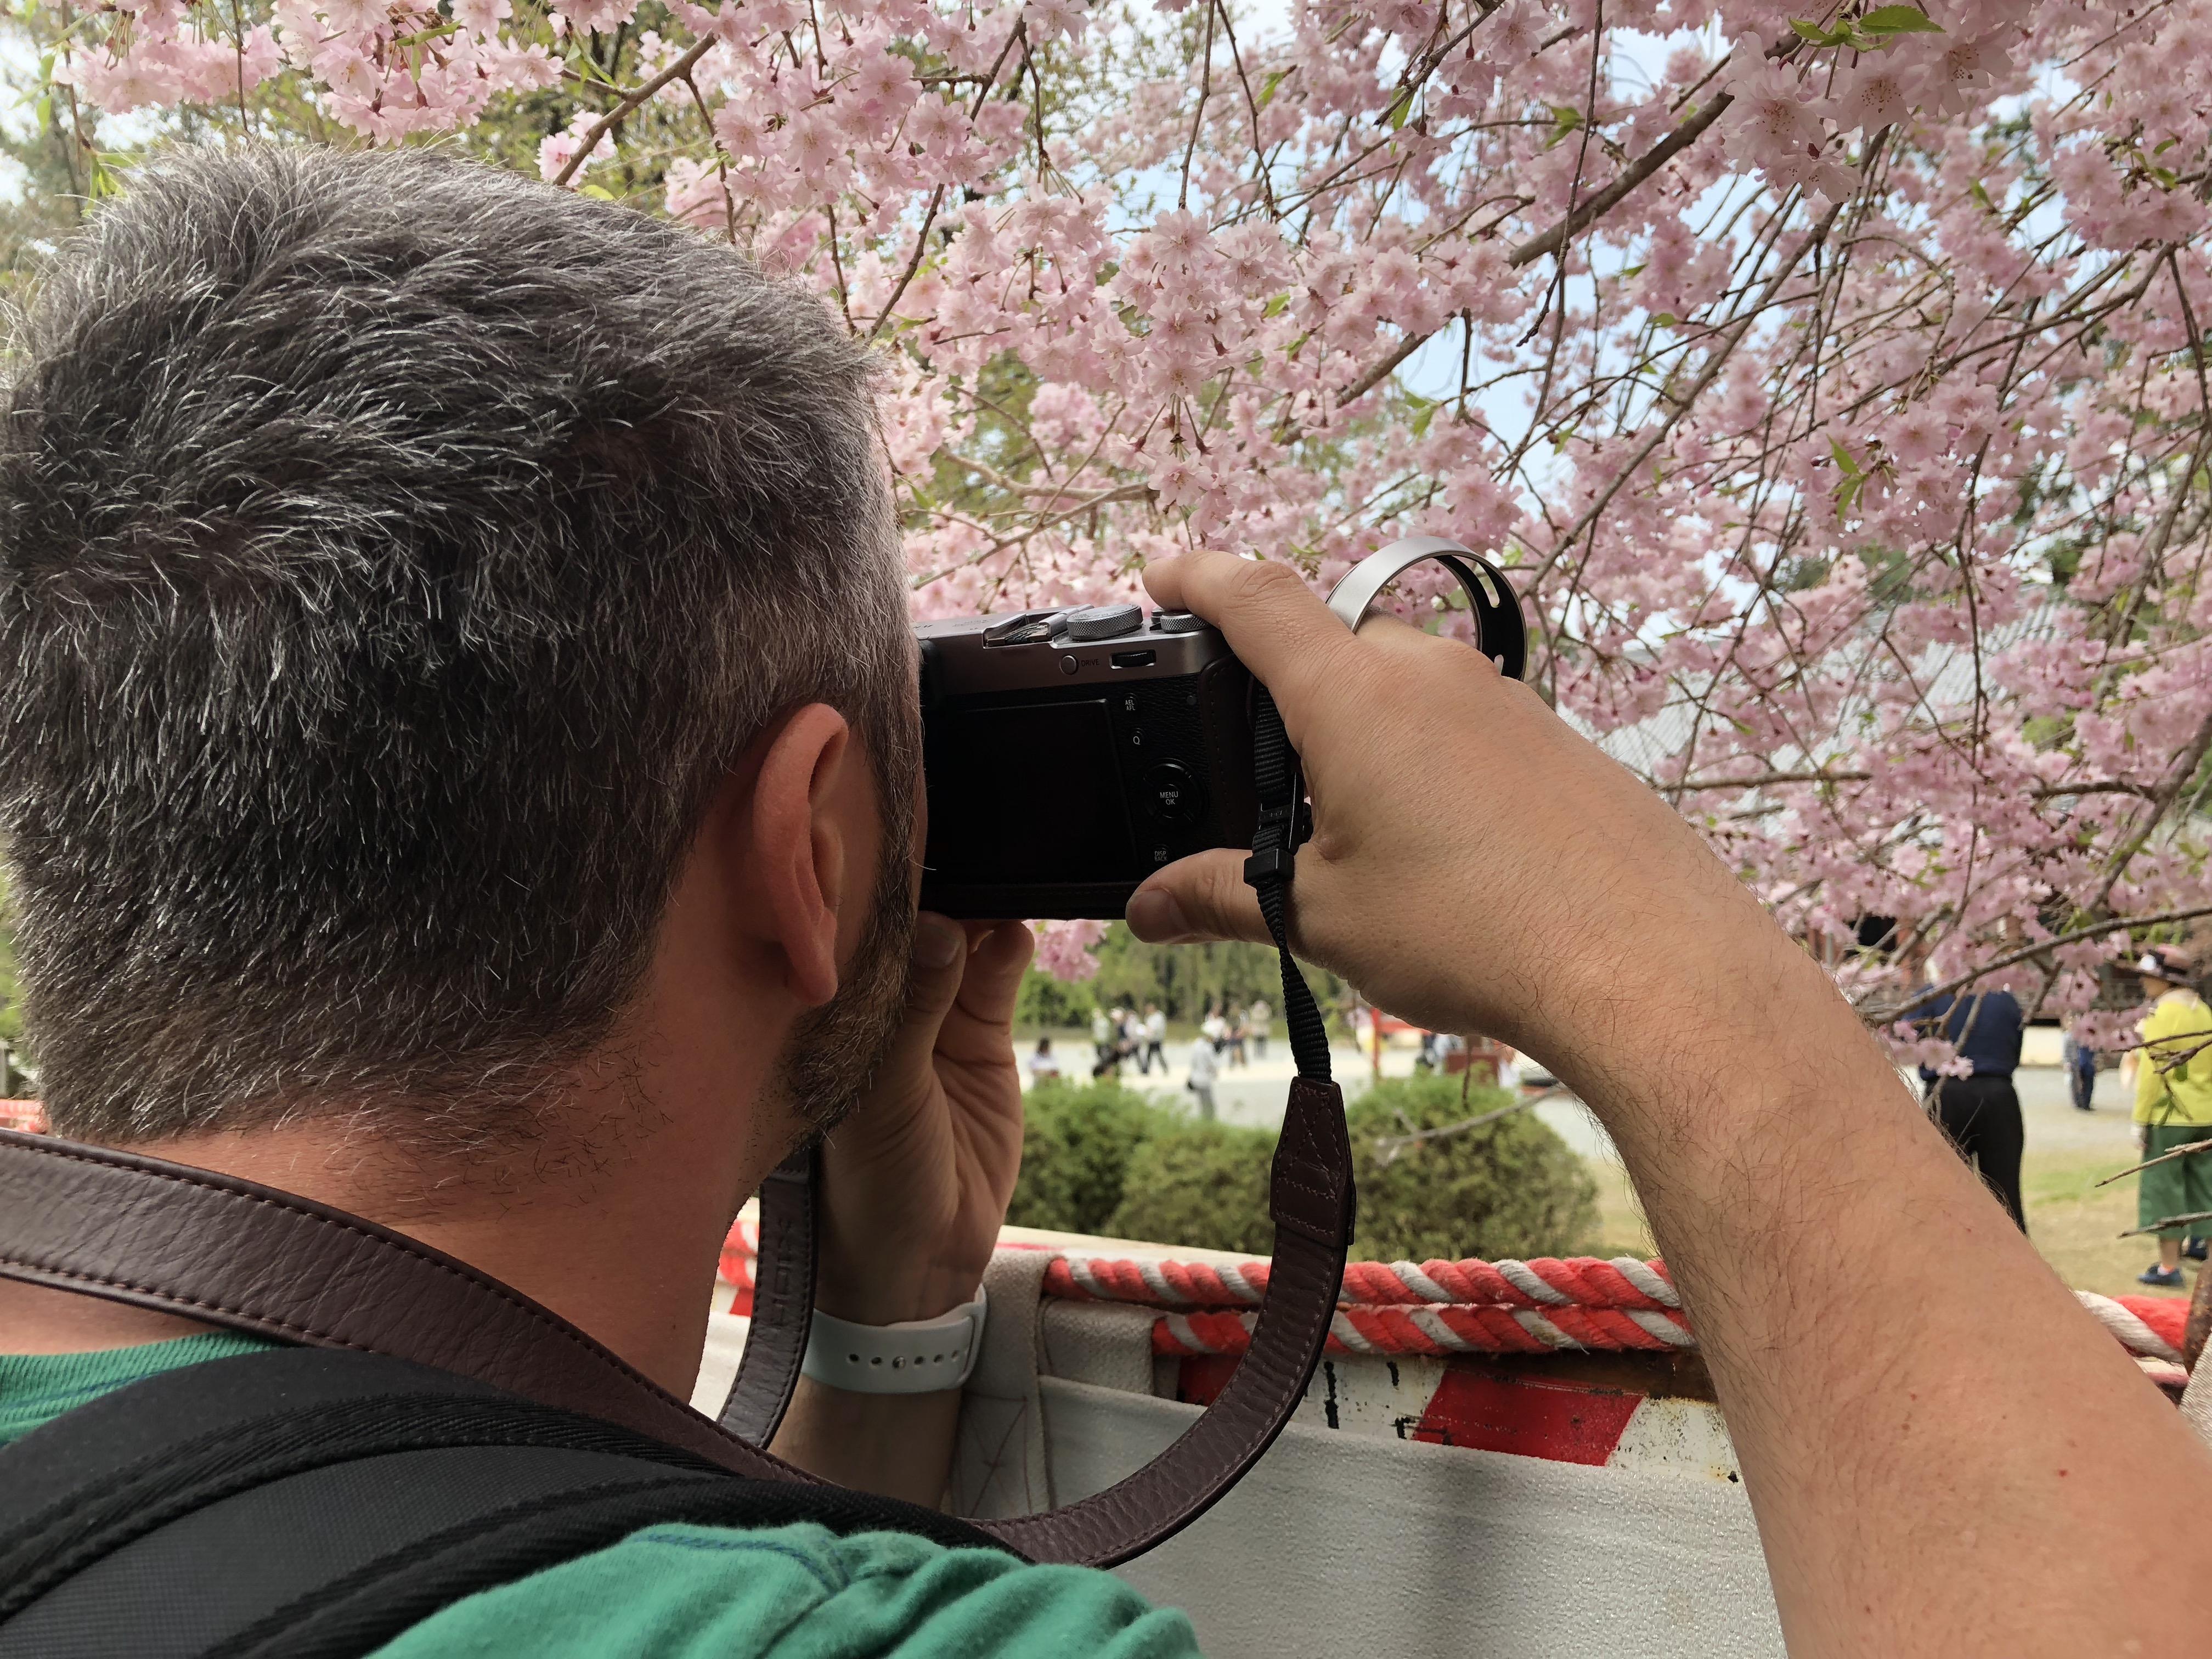 Super Sake Boy taking a photo of the sakura, cherry blossom at Daigo-Ji in Kyoto in Japan